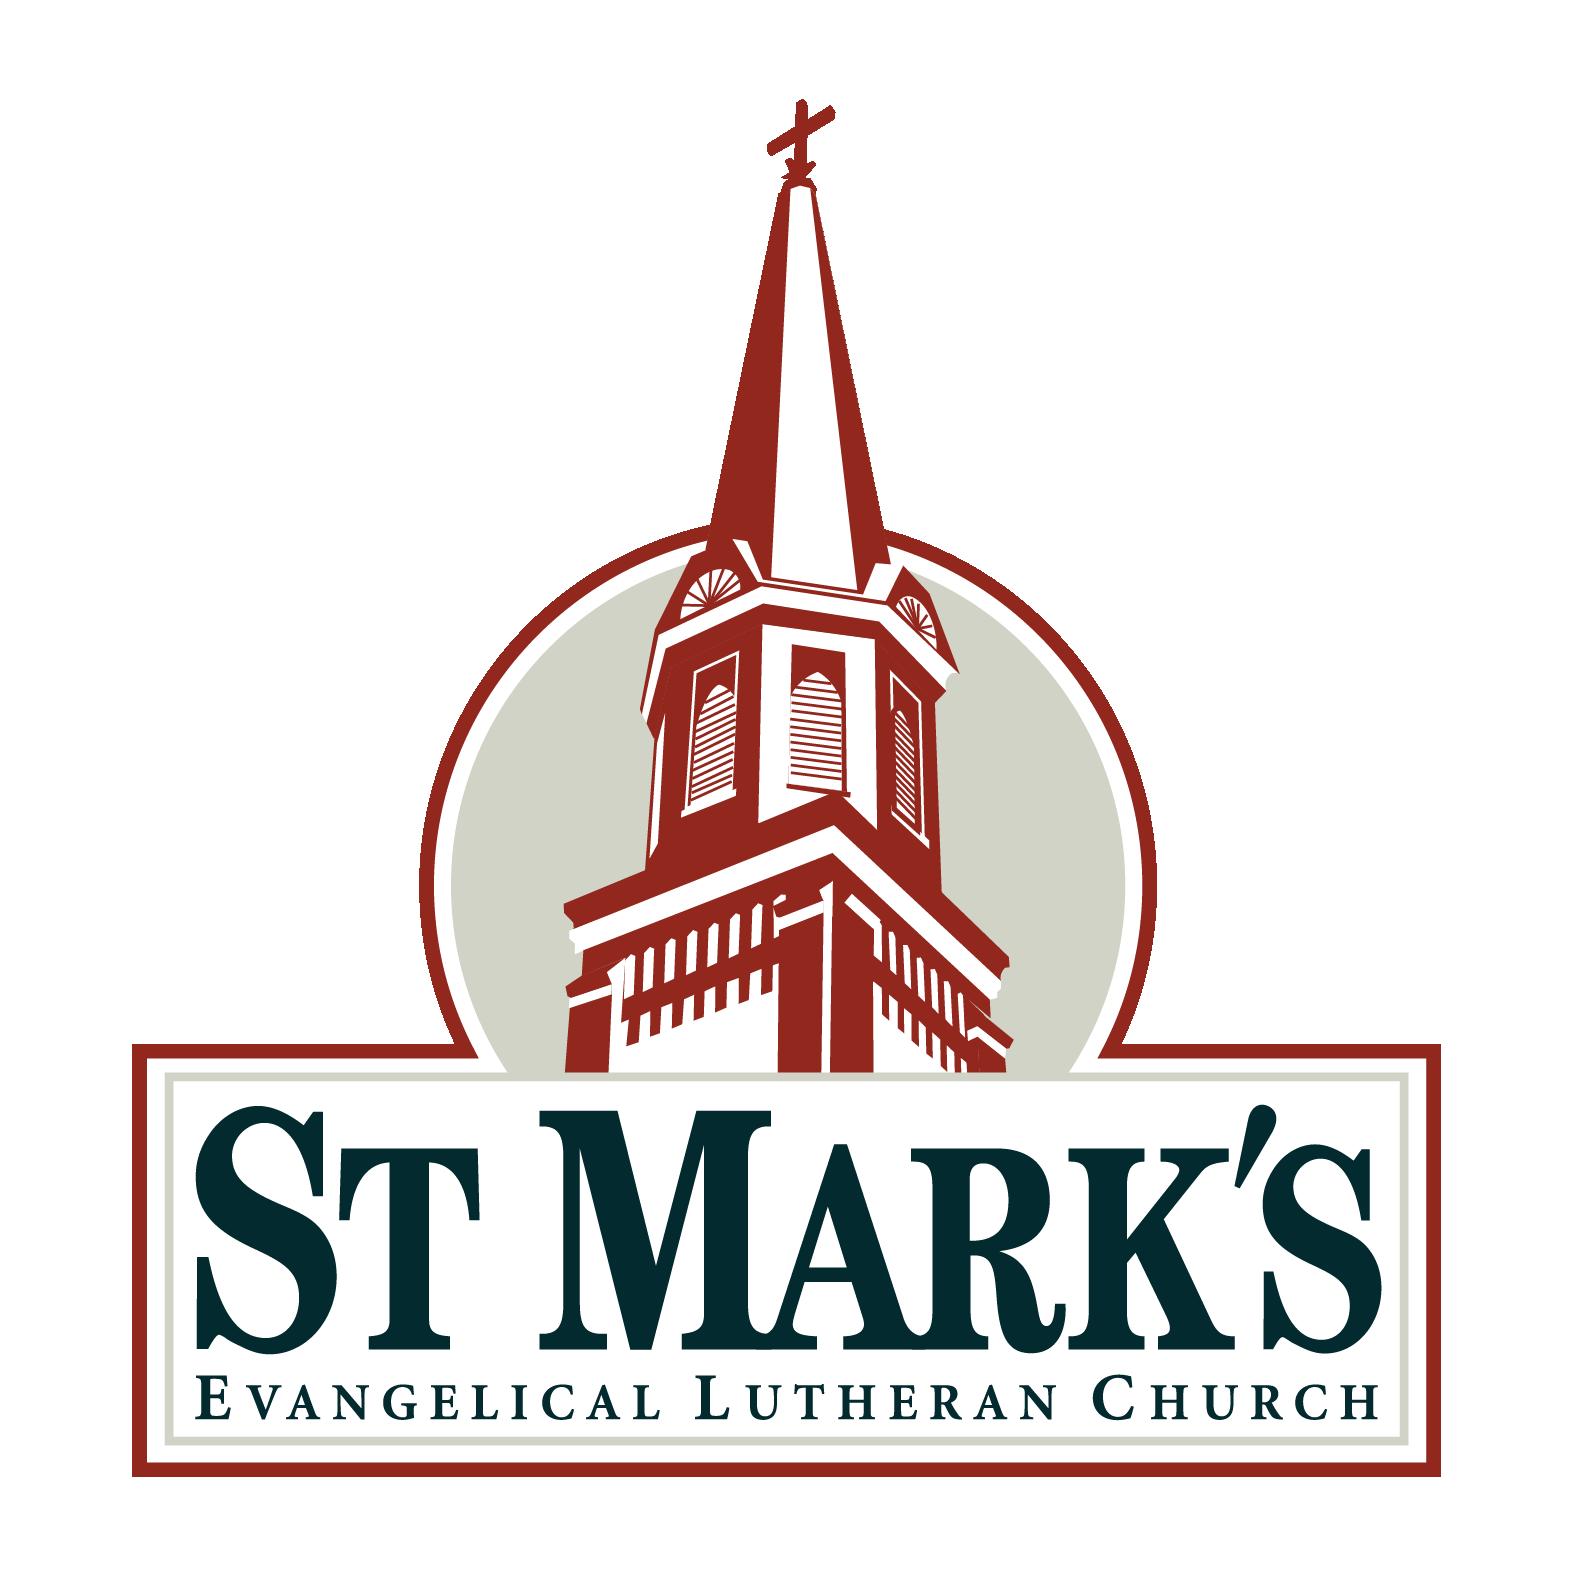 StMarks_ChurchLogo_Color-01